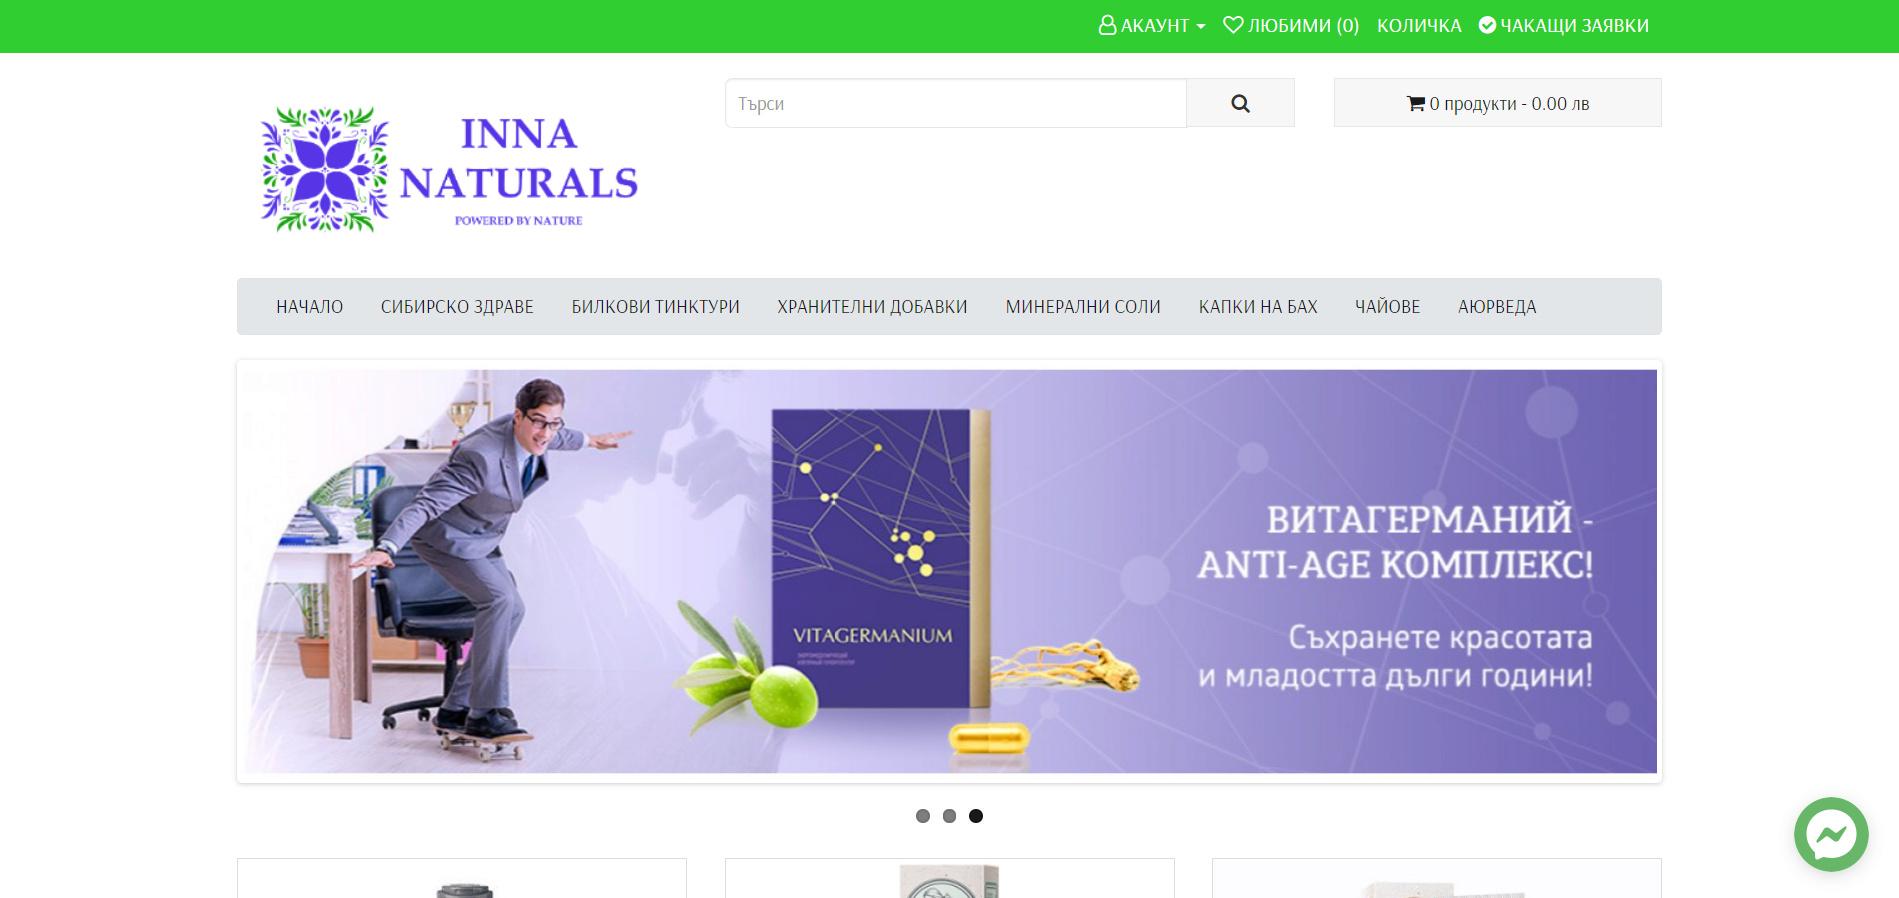 Магазин за здравословни продукти - Inna Naturals Shop